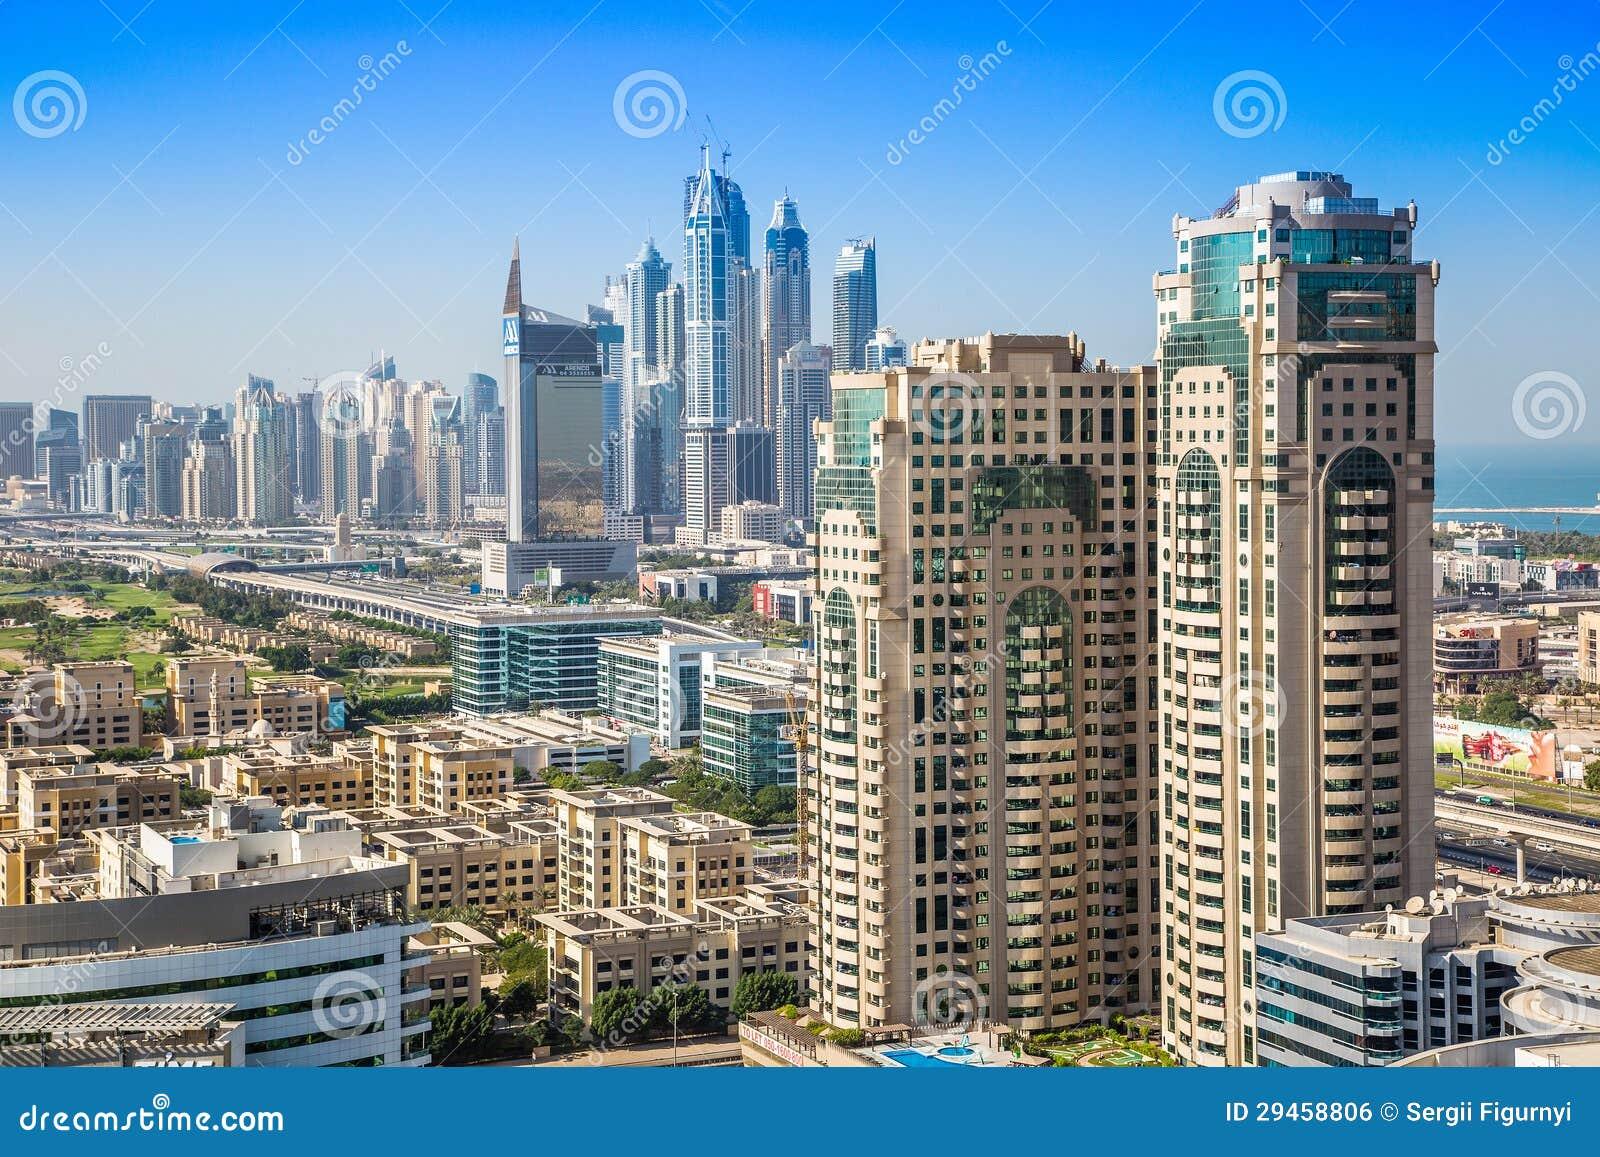 Best Hotels Near Dubai Mall